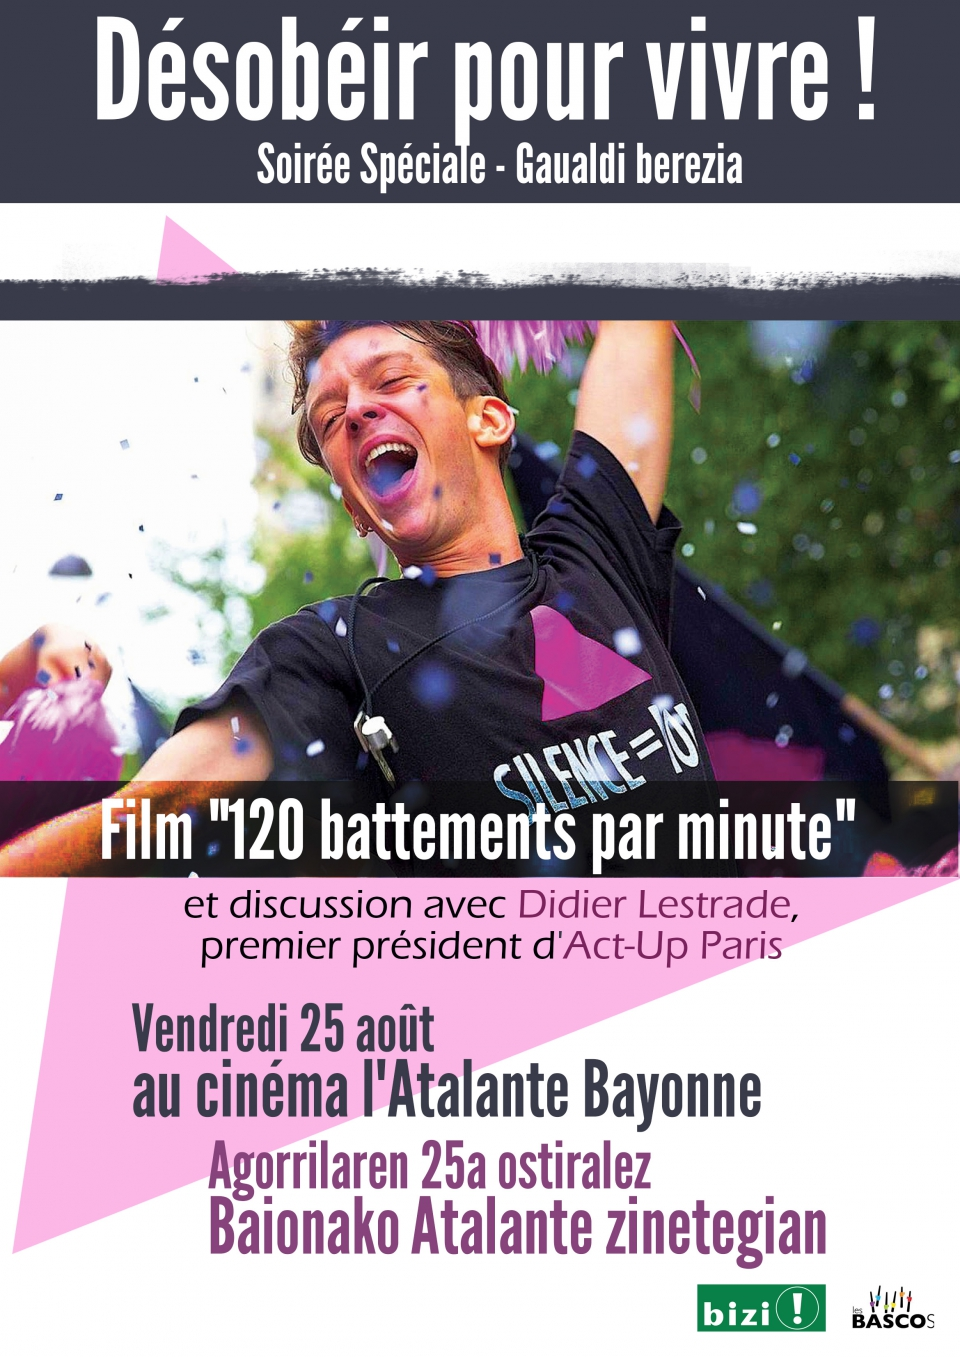 affichefilm 120 (2).jpg